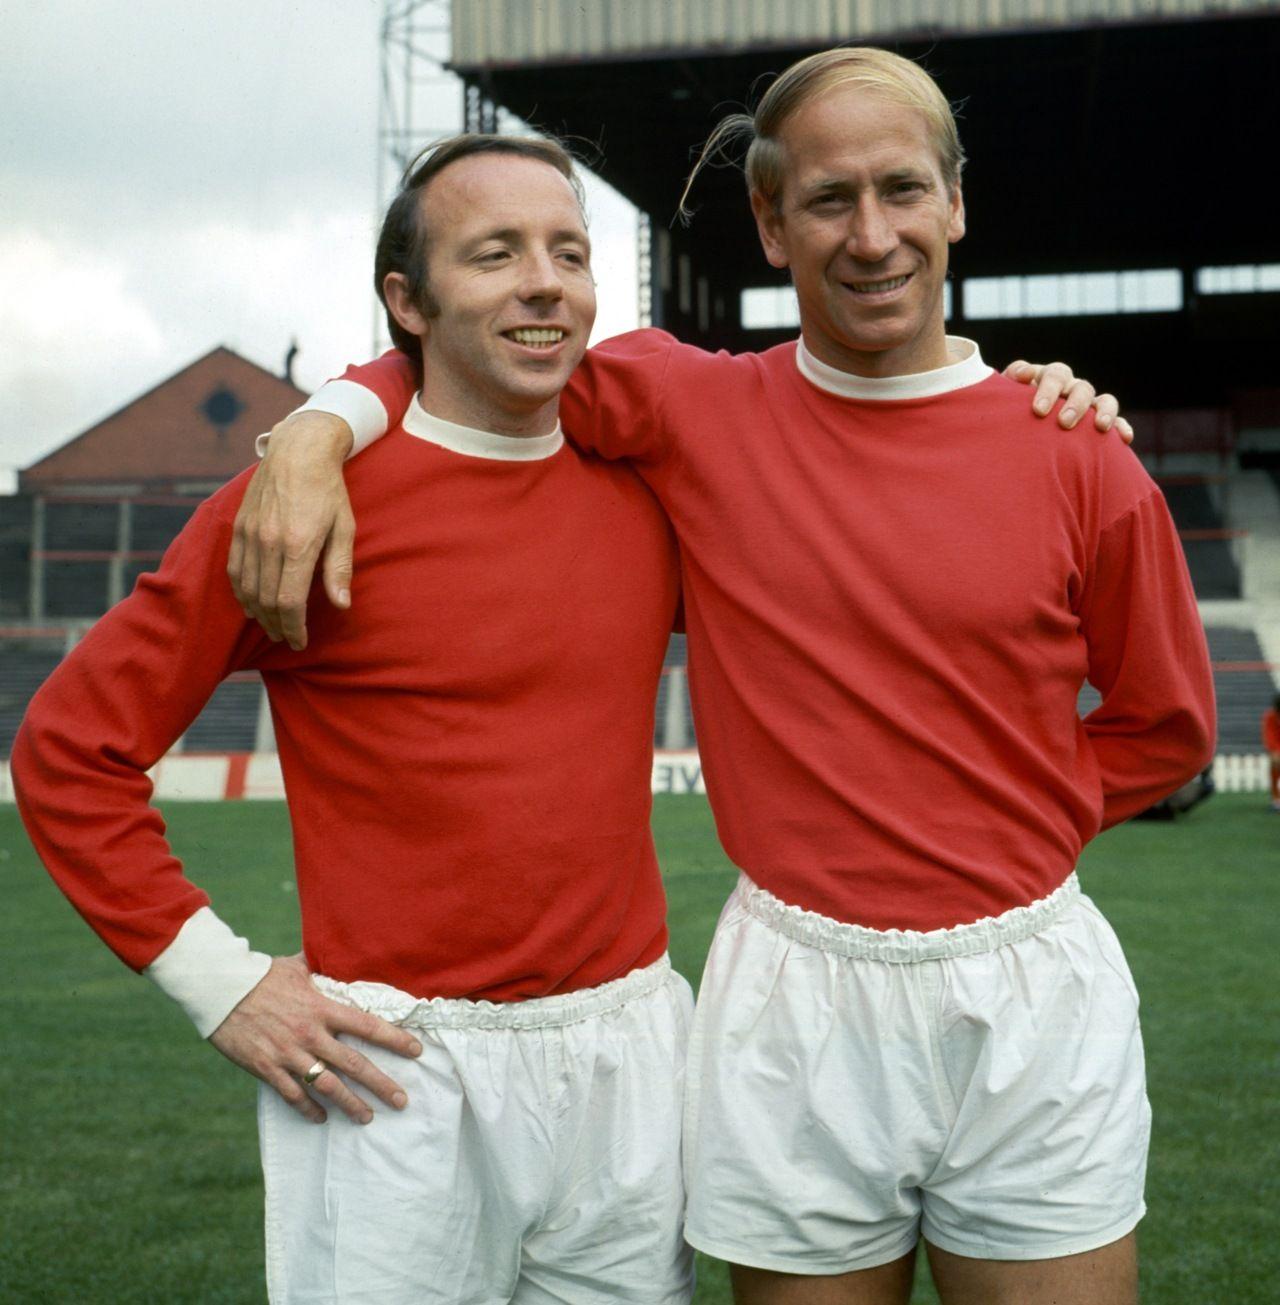 ¿Cuánto mide Bobby Charlton? - Altura - Real height 7f702a0a66c91abc9bea4b9a5cd5cf4a